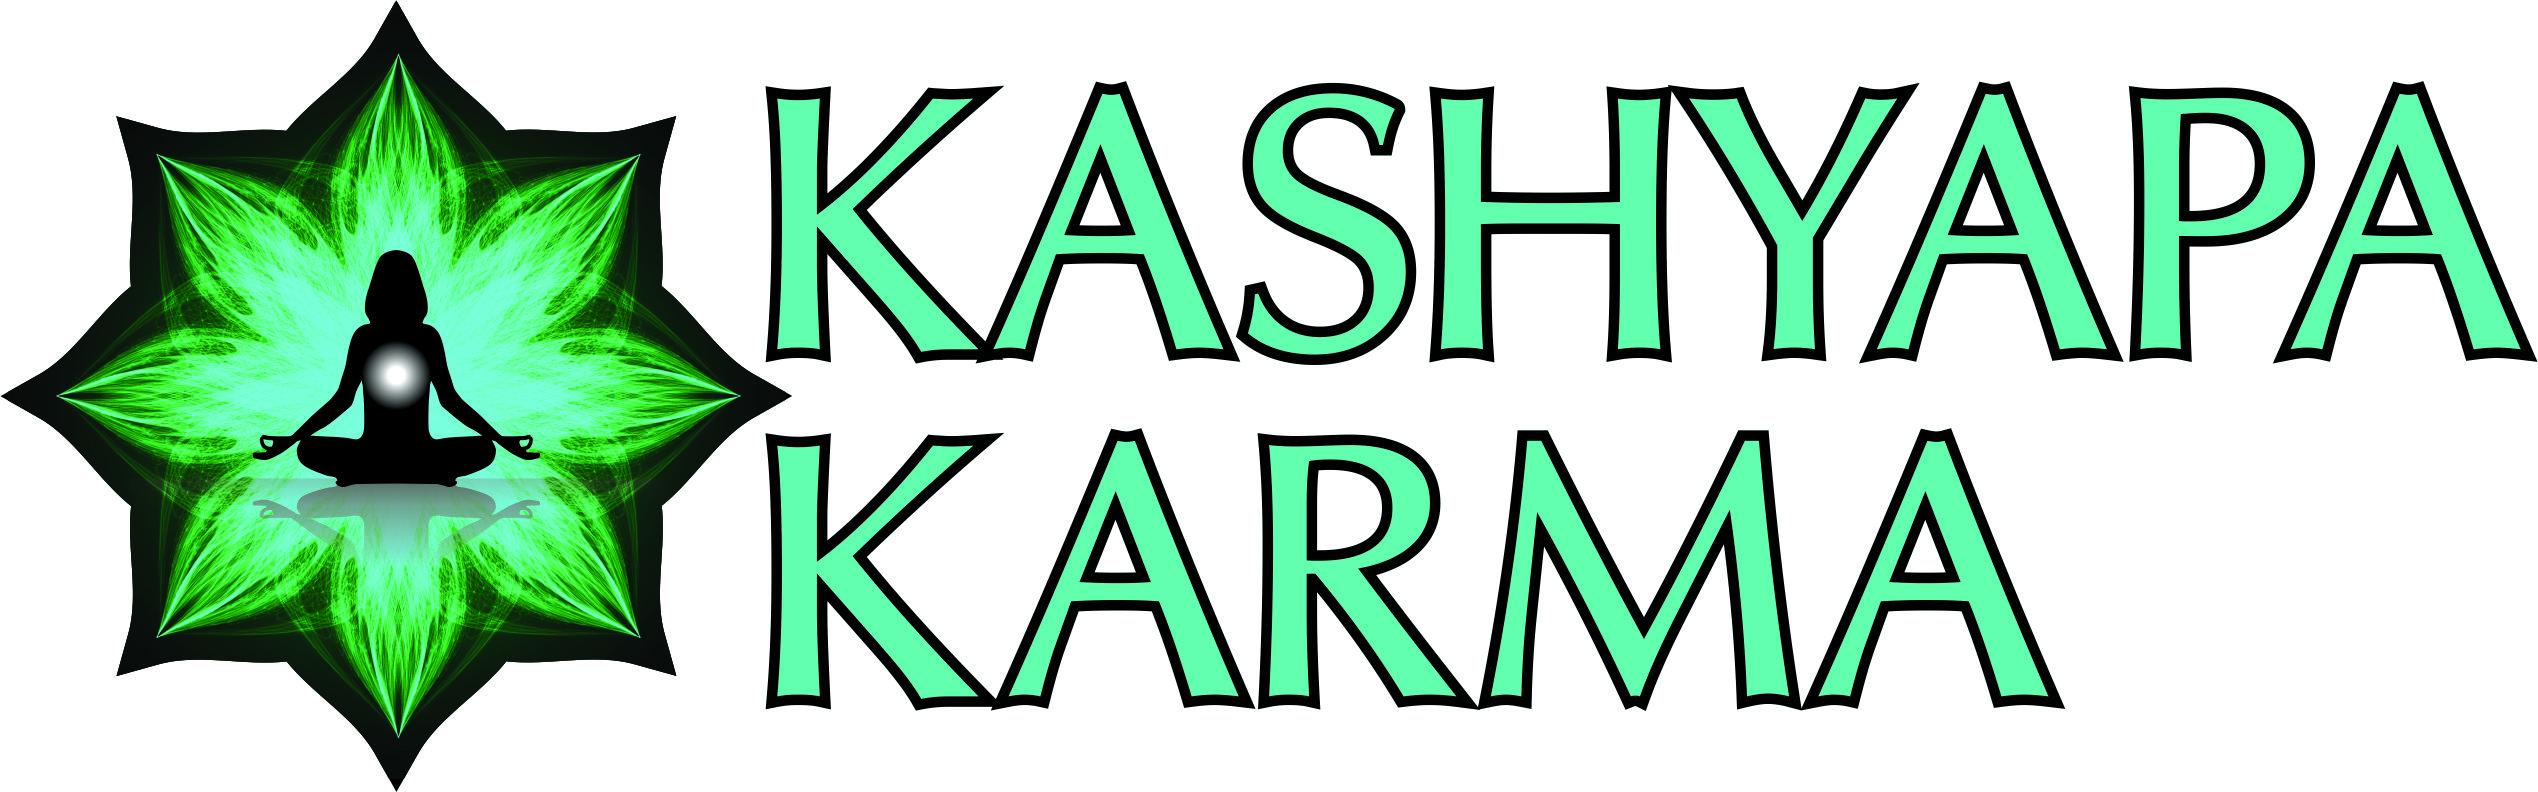 Kashyapa Karma